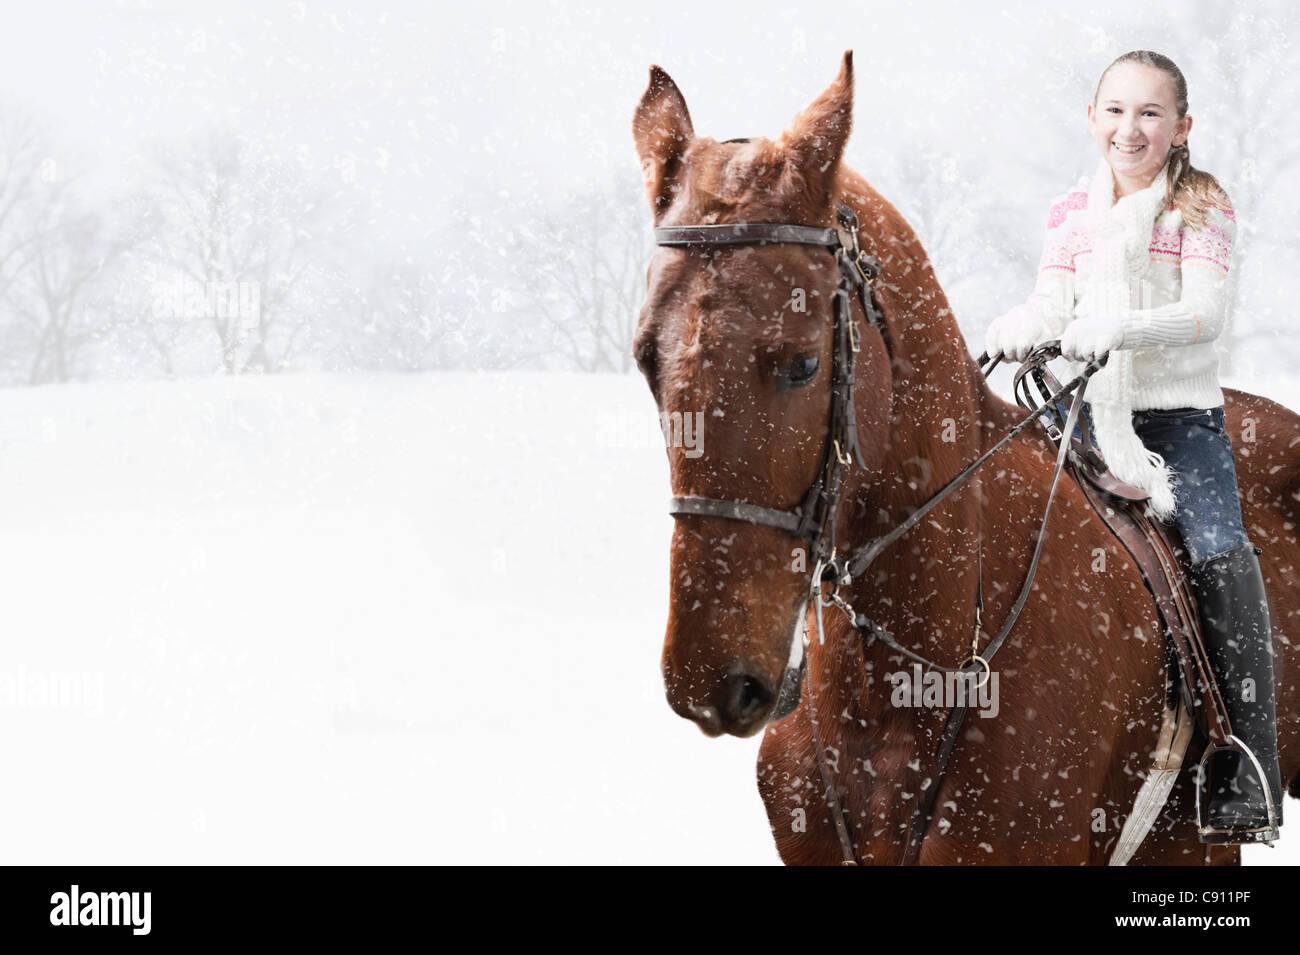 États-unis, Illinois, Metamora, Smiling girl (10-11) cheval en hiver Photo Stock